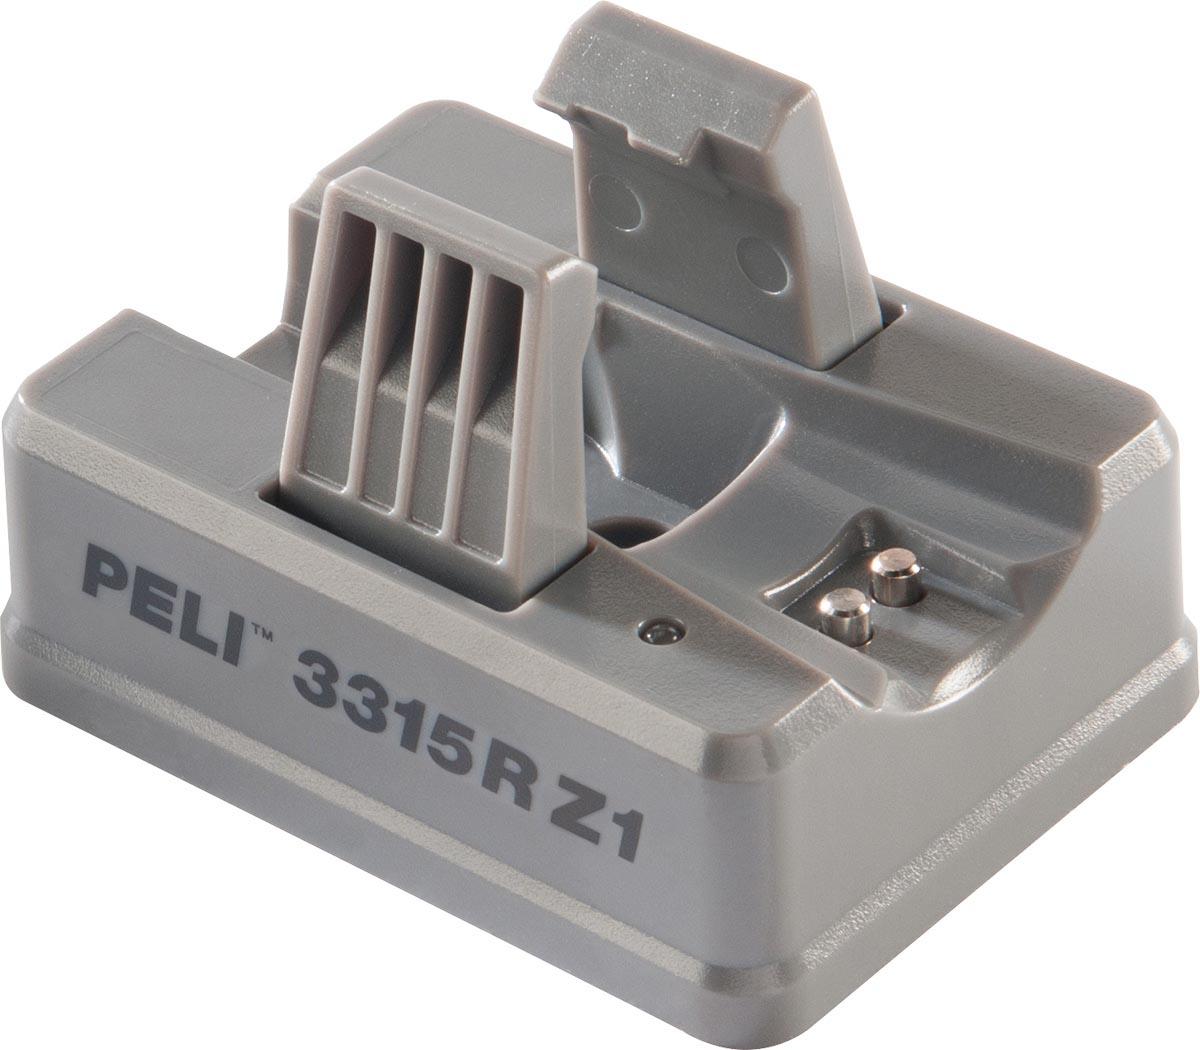 peli 3318 deck dash charger base